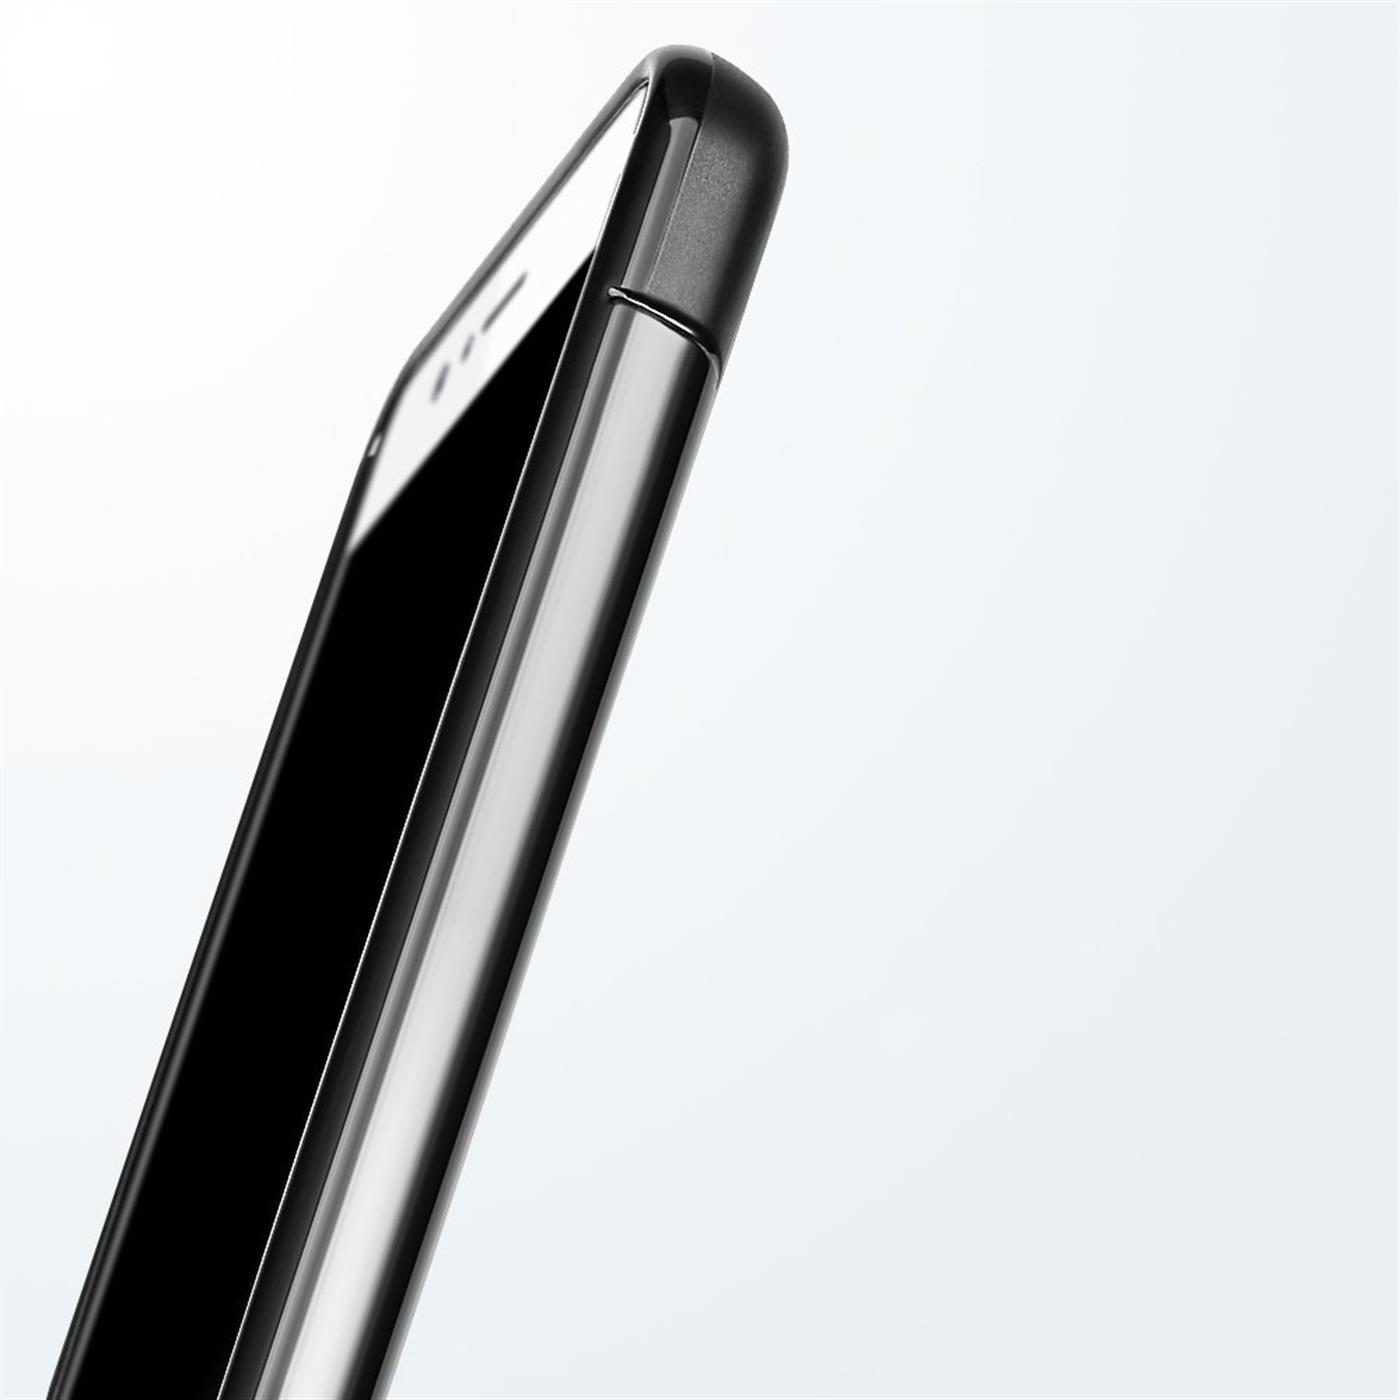 LG-Leon-LTE-Silikon-Gel-S-Line-Case-Cover-Ultra-Thin-Slim-Back-Bumper Indexbild 22